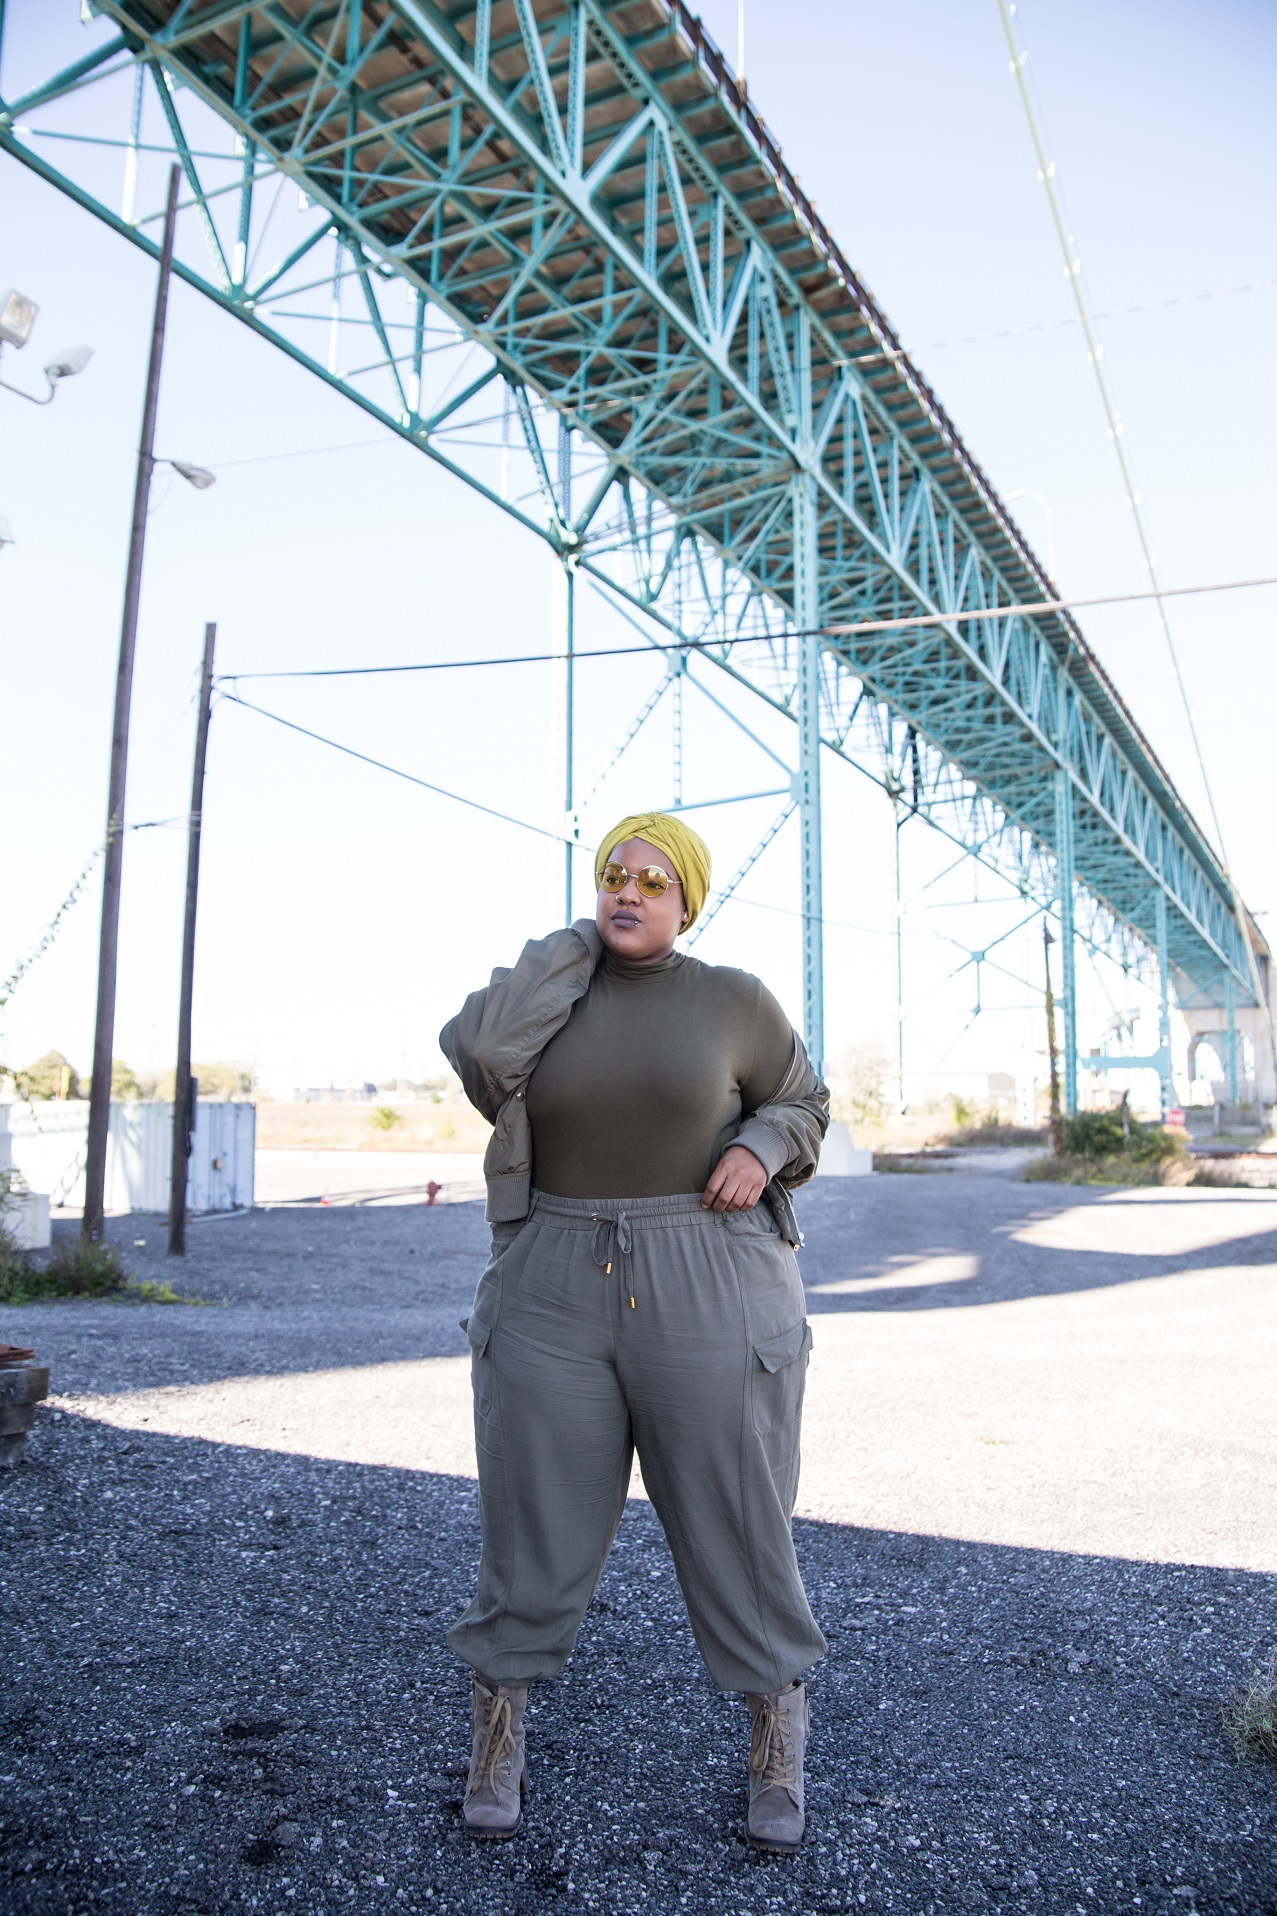 Leah-Vernon-Muslim-Girl-Plus-Size-Model-Body-Positive-Detroit.jpg